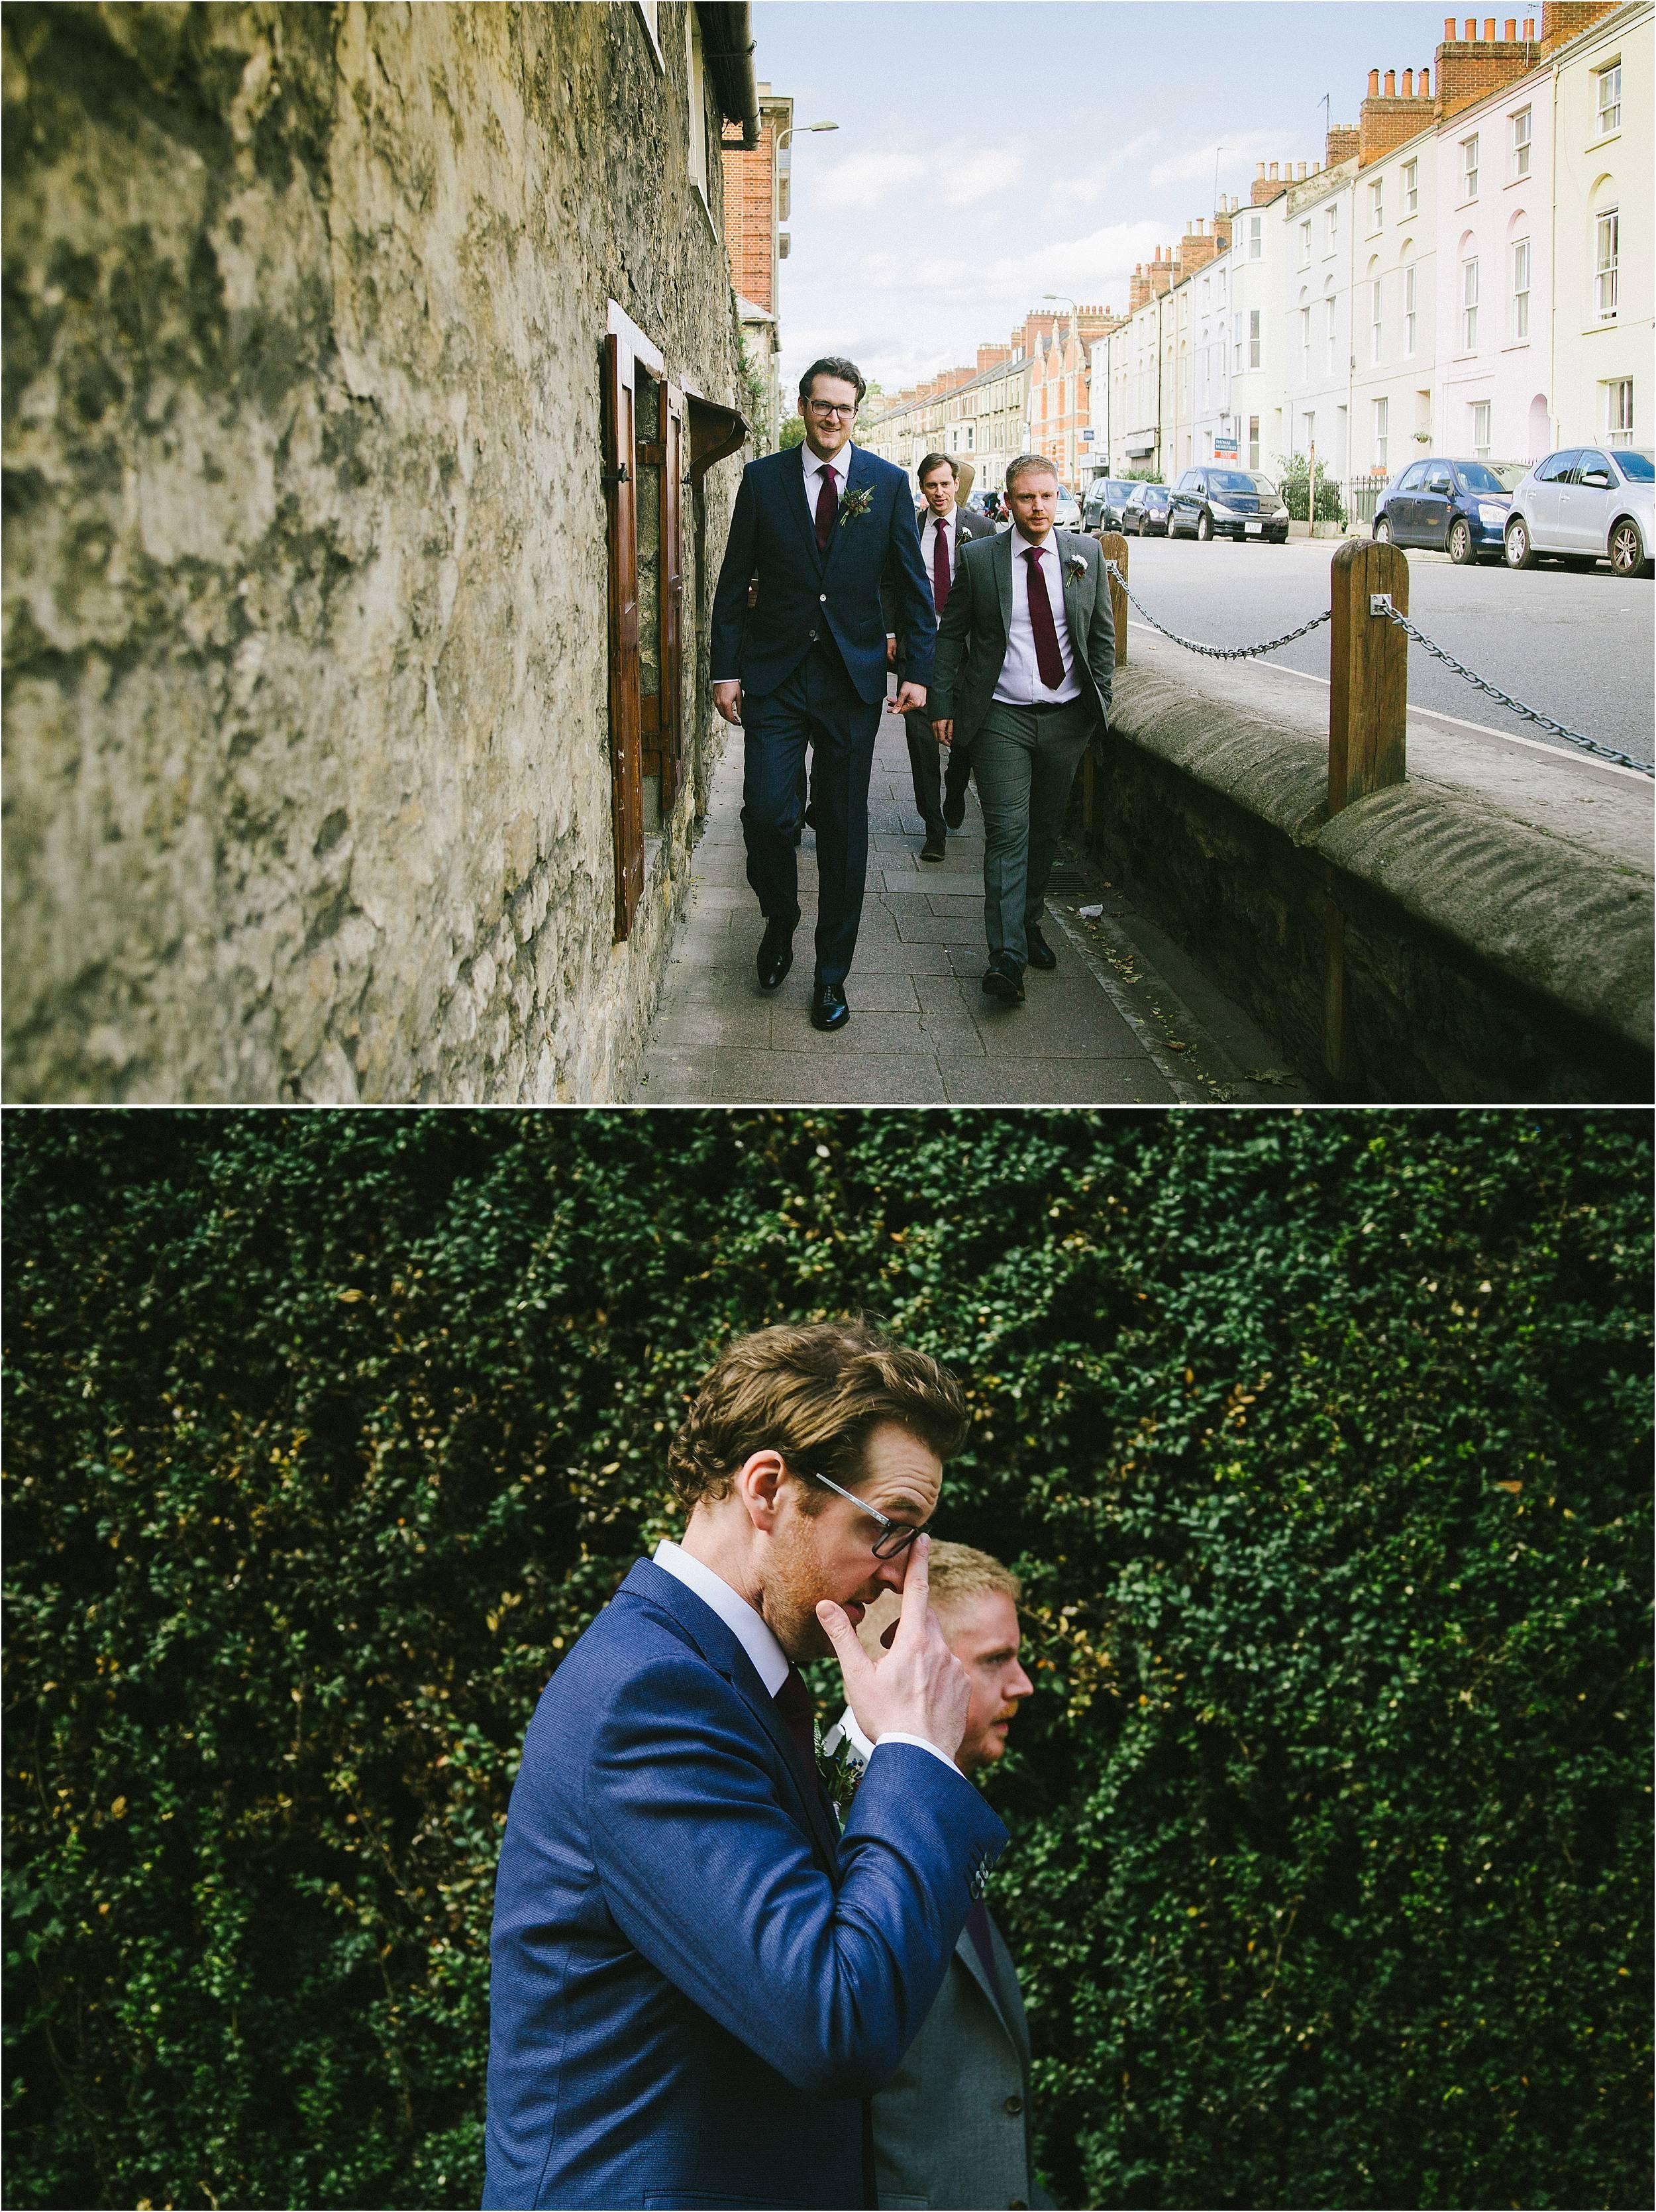 Oxford Ashmolean Museum Wedding Photography_0042.jpg